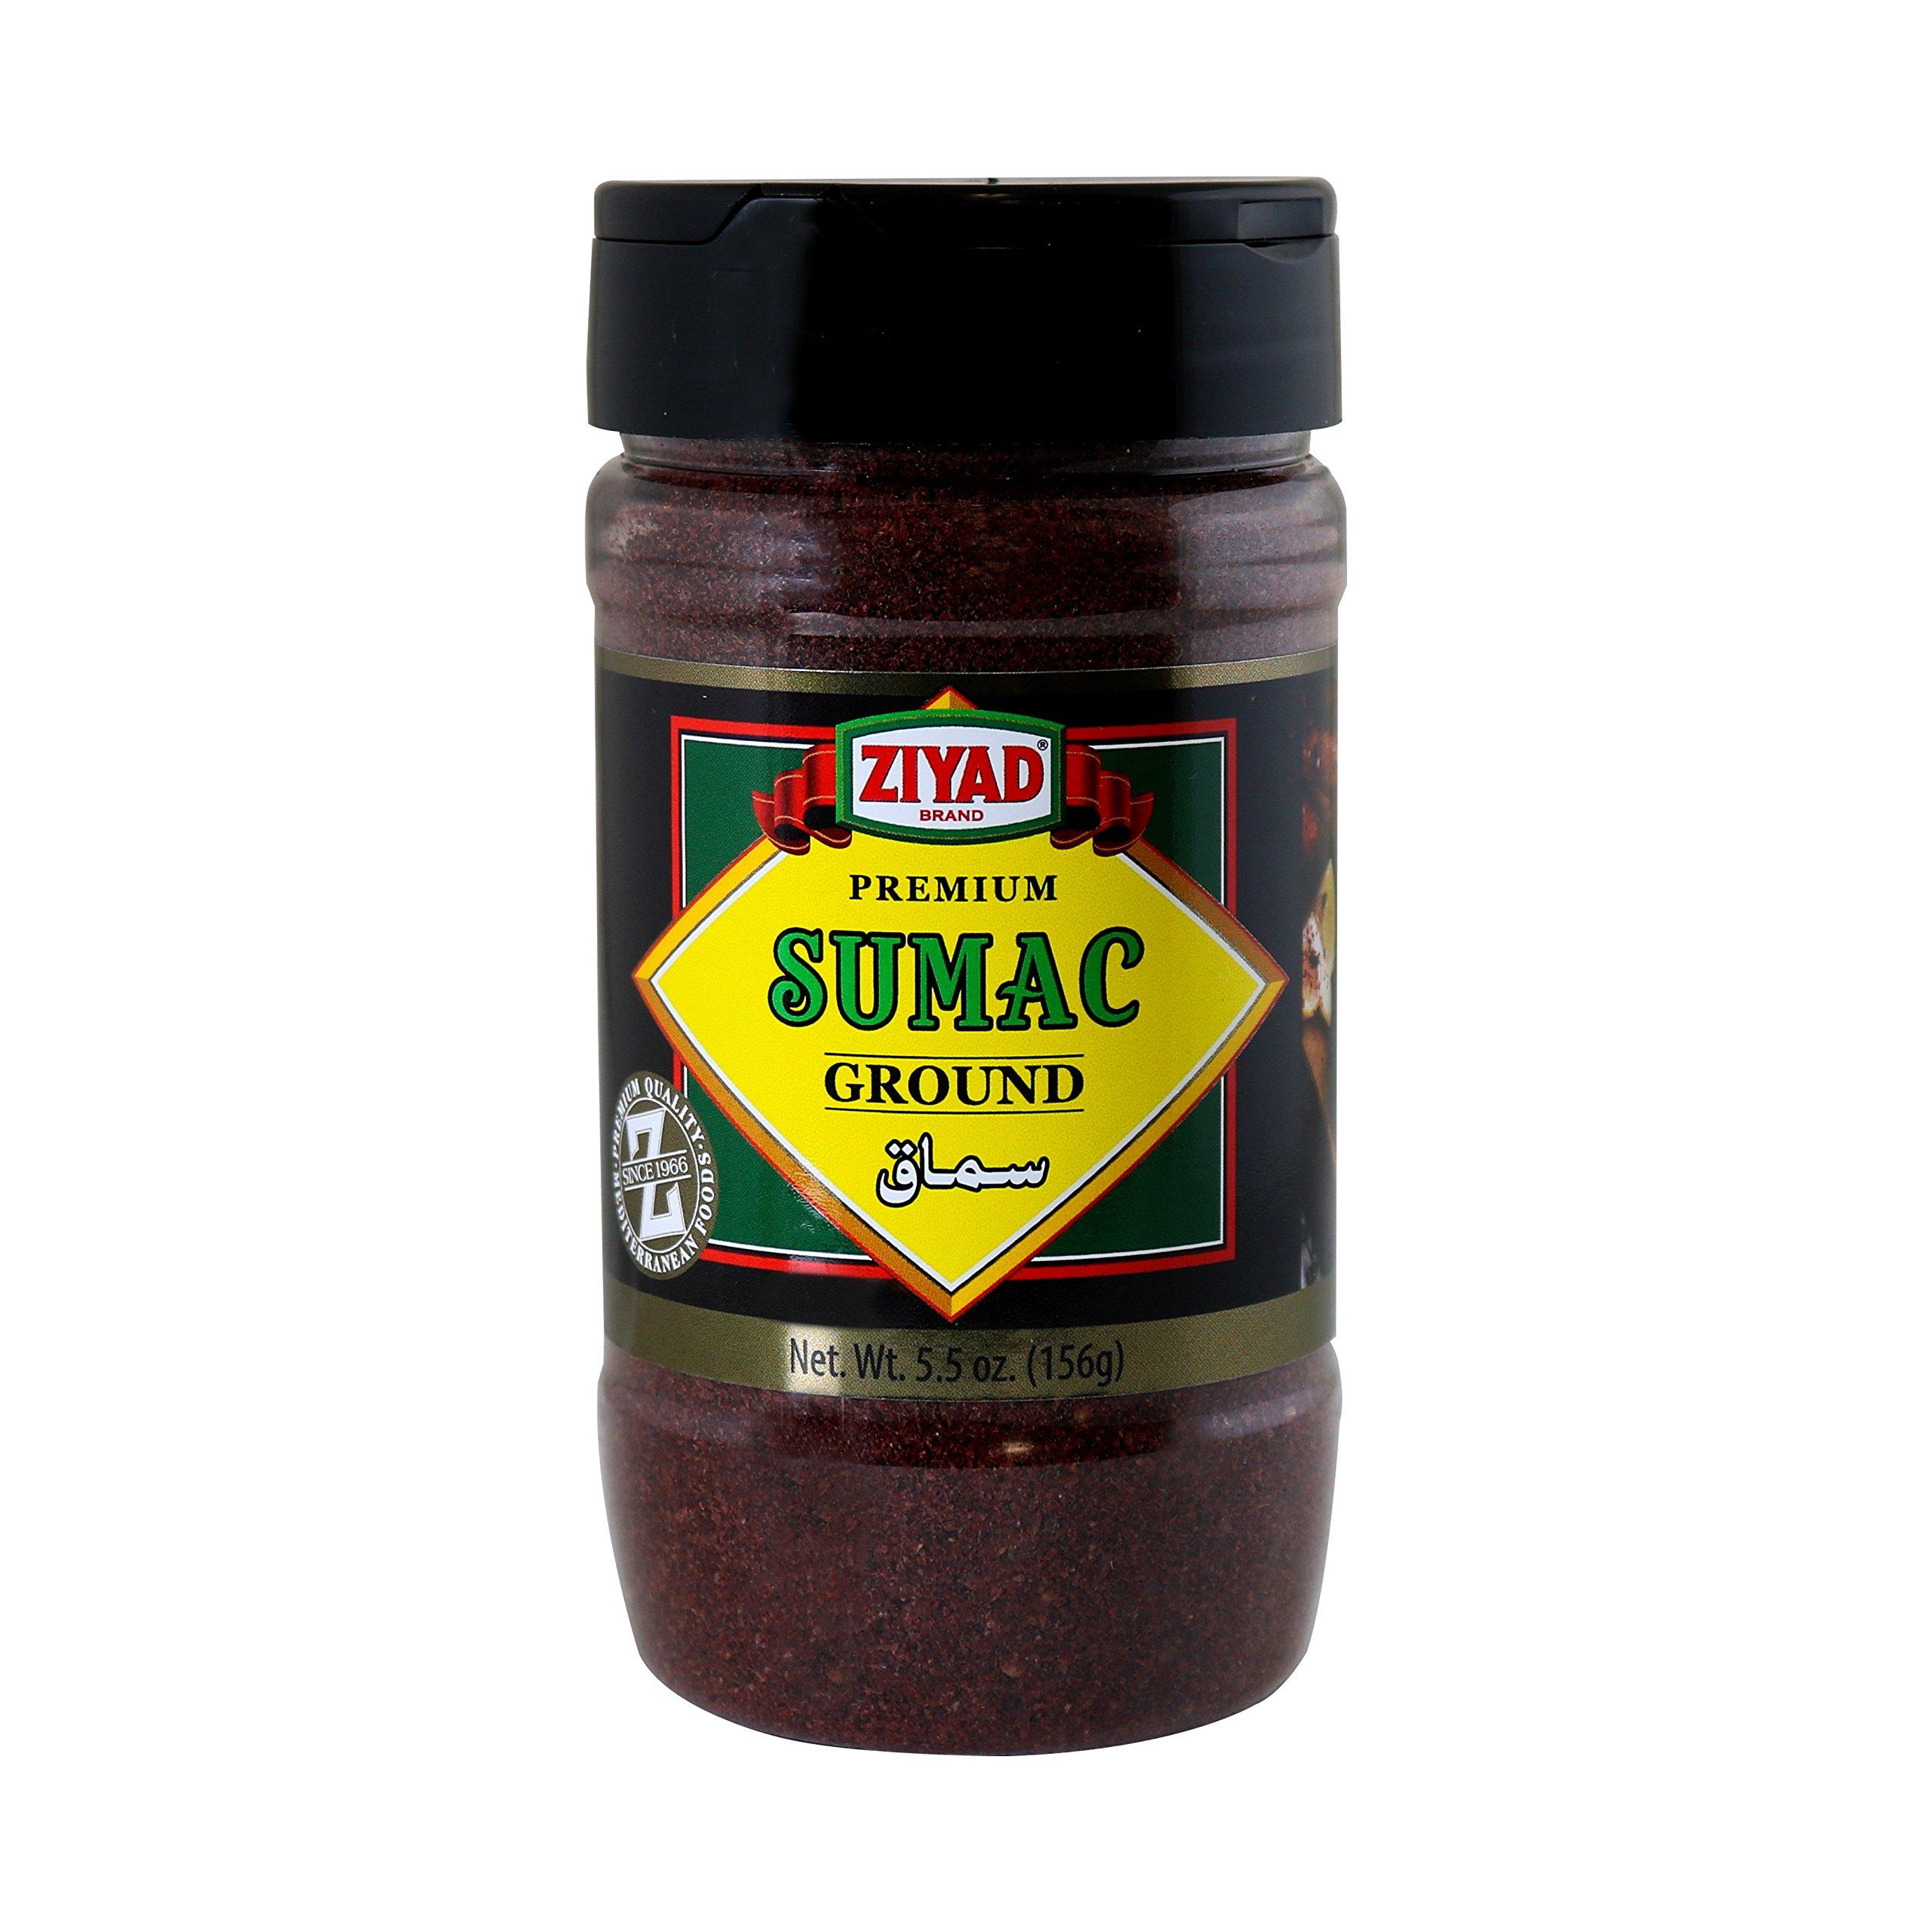 Ziyad brand Premium Ground Sumac Spice 5.5 ounce (Pack - 2)